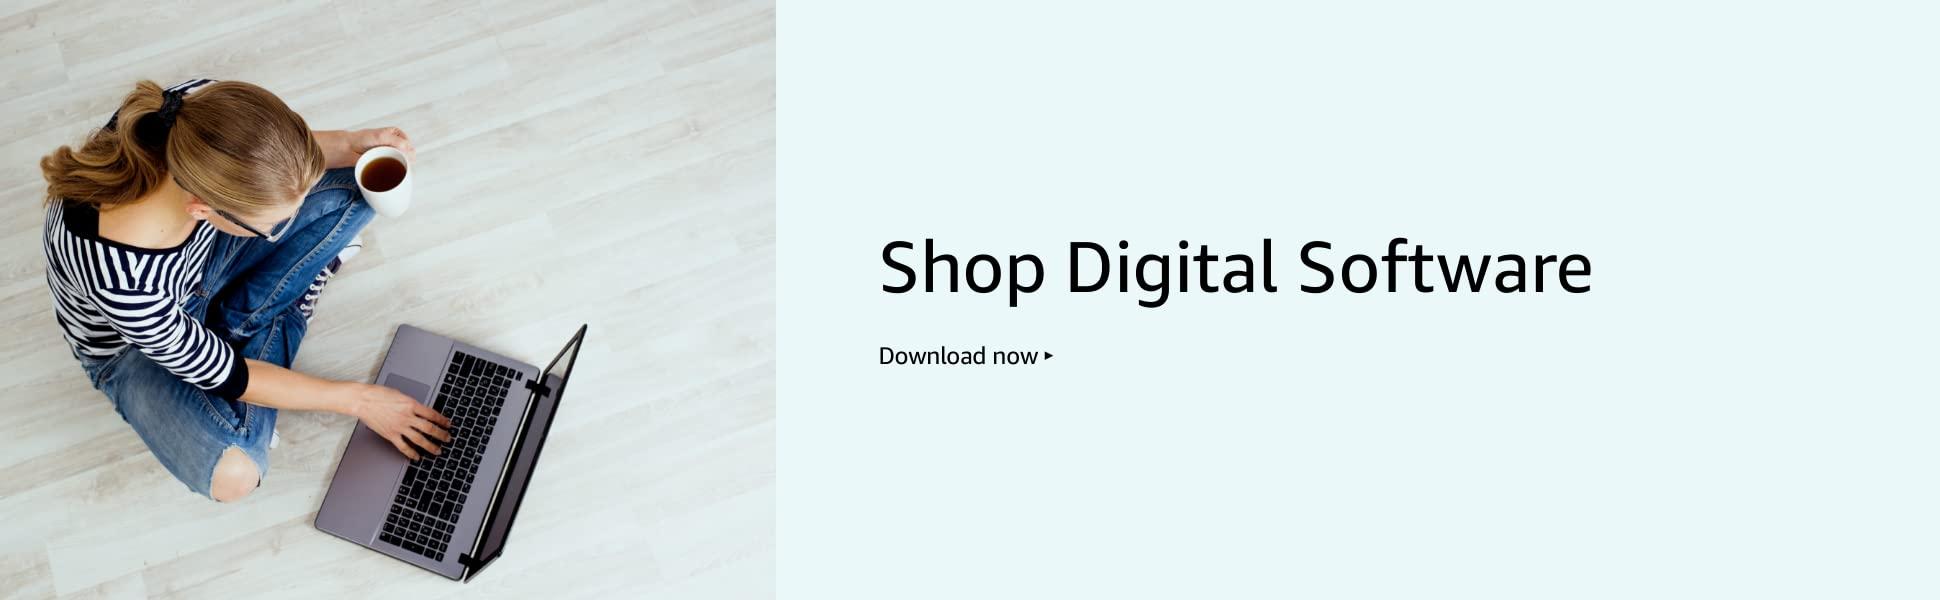 Shop Digital Software